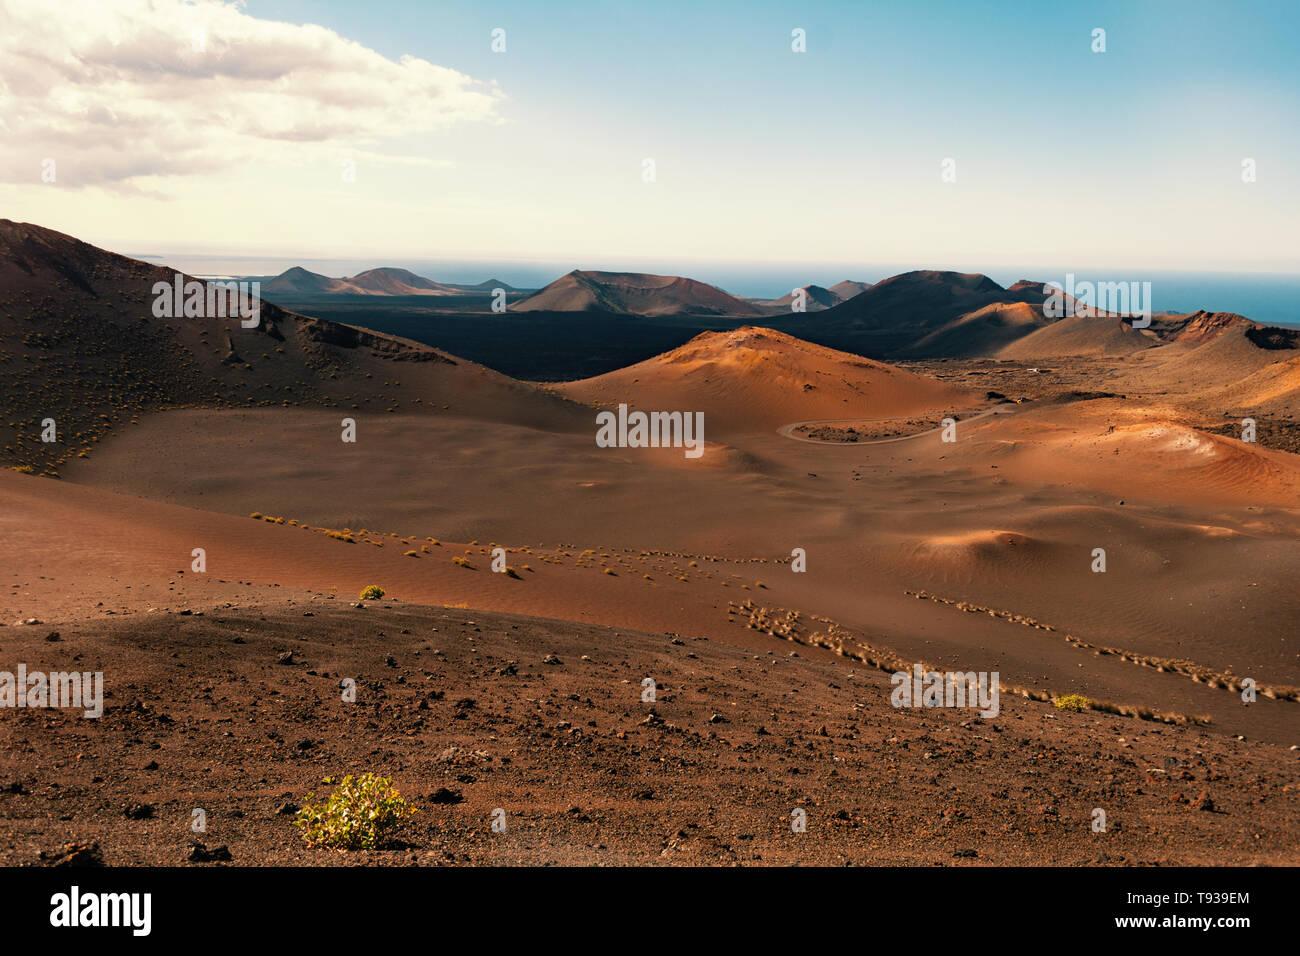 Insel Lanzarote wunderbare Natur Bilder vom Vulkan Gestein - Stock Image